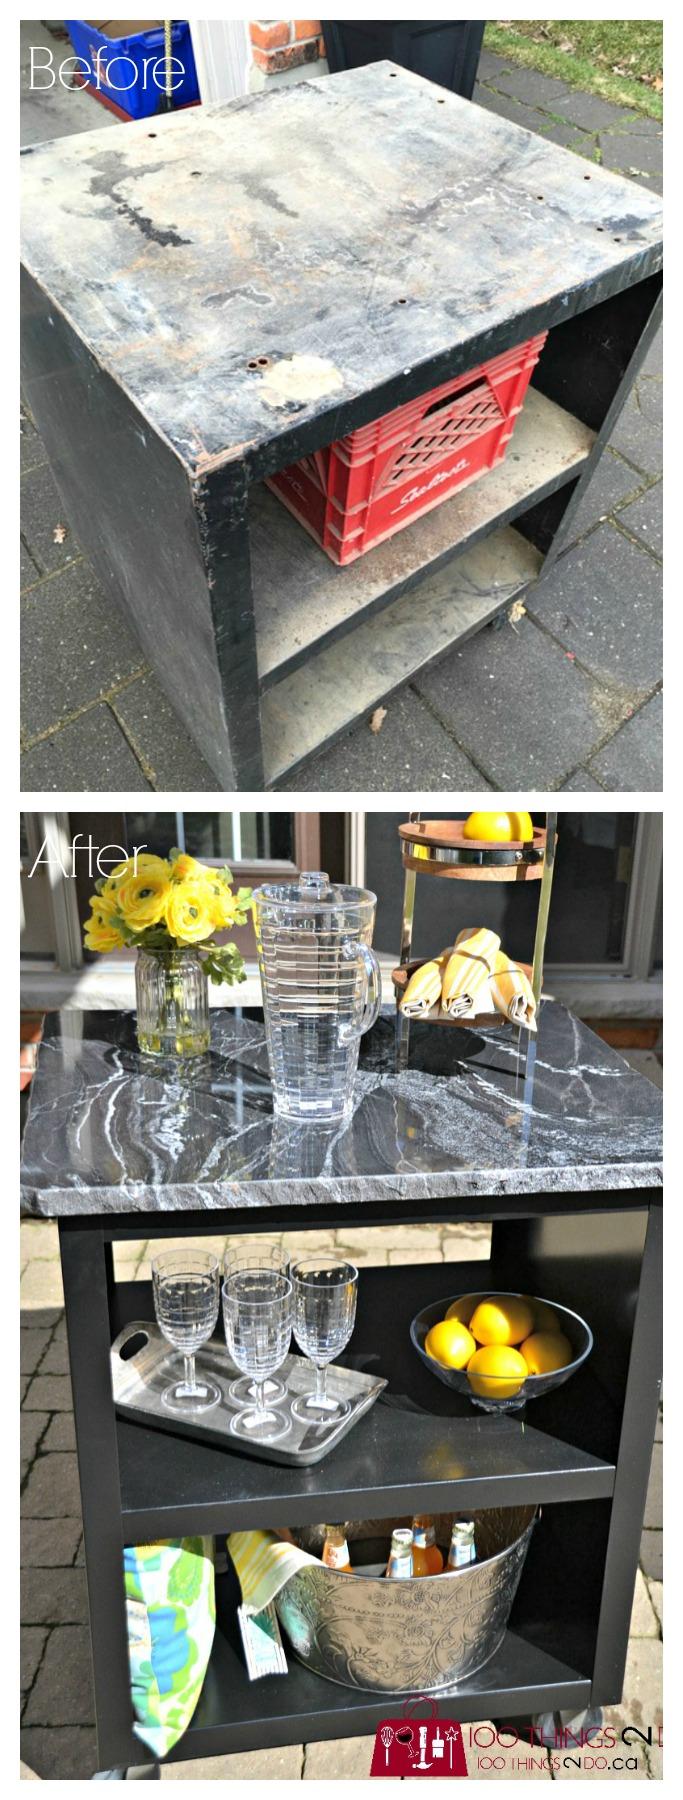 patio bar cart, bar cart, upcycled bar cart, patio grilling station, DIY grilling station, DIY bar cart, Progressive Countertops, Rustoleum